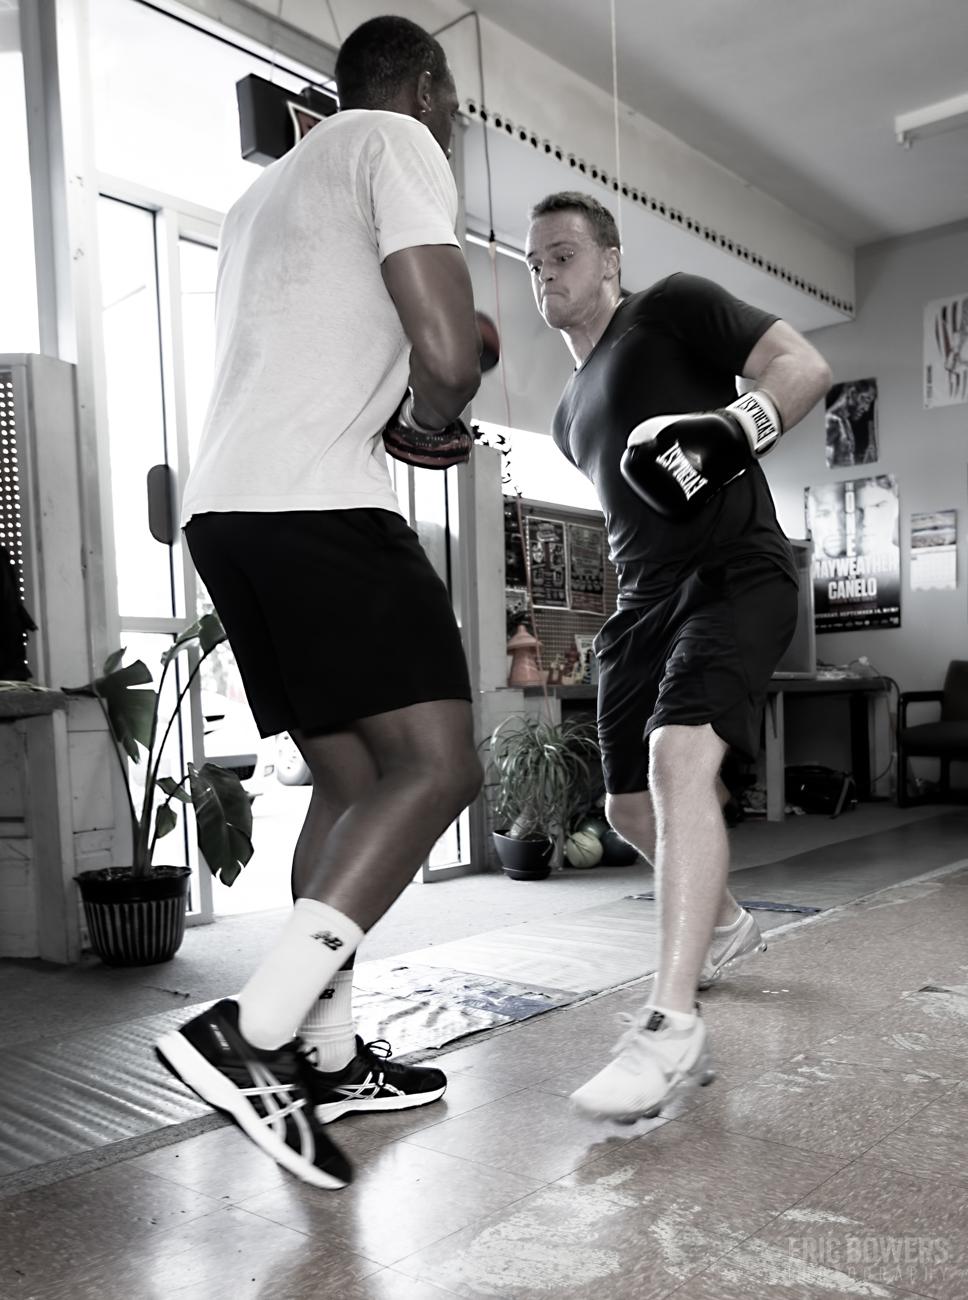 Boxing Gym Scenes (64)